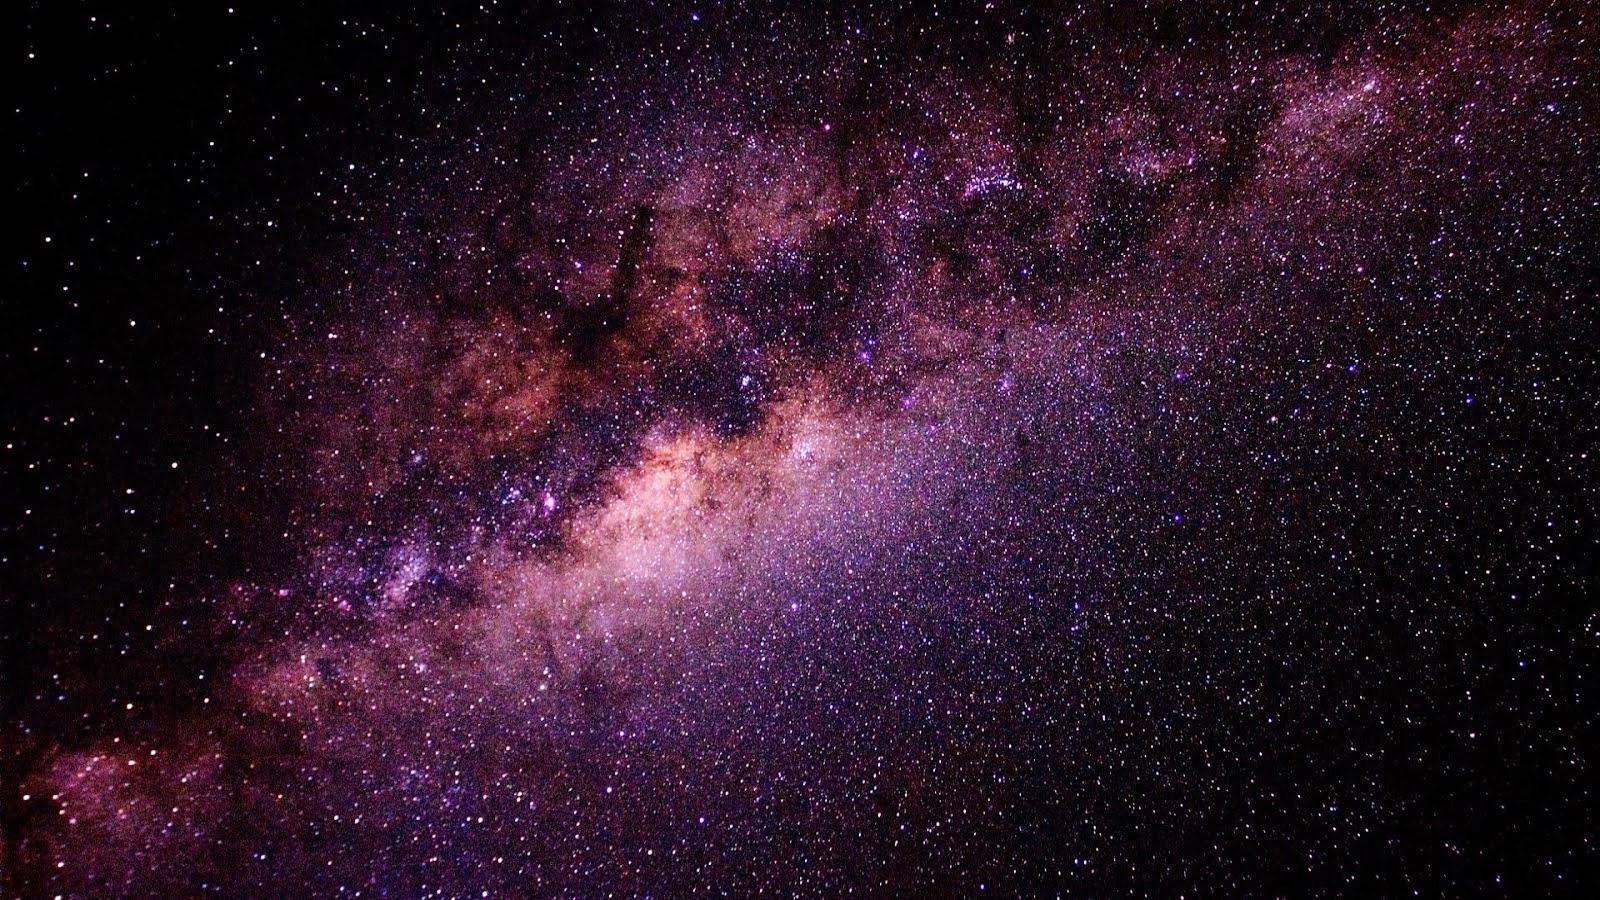 Galaxy 1080p Wallpapers - WallpaperSafari